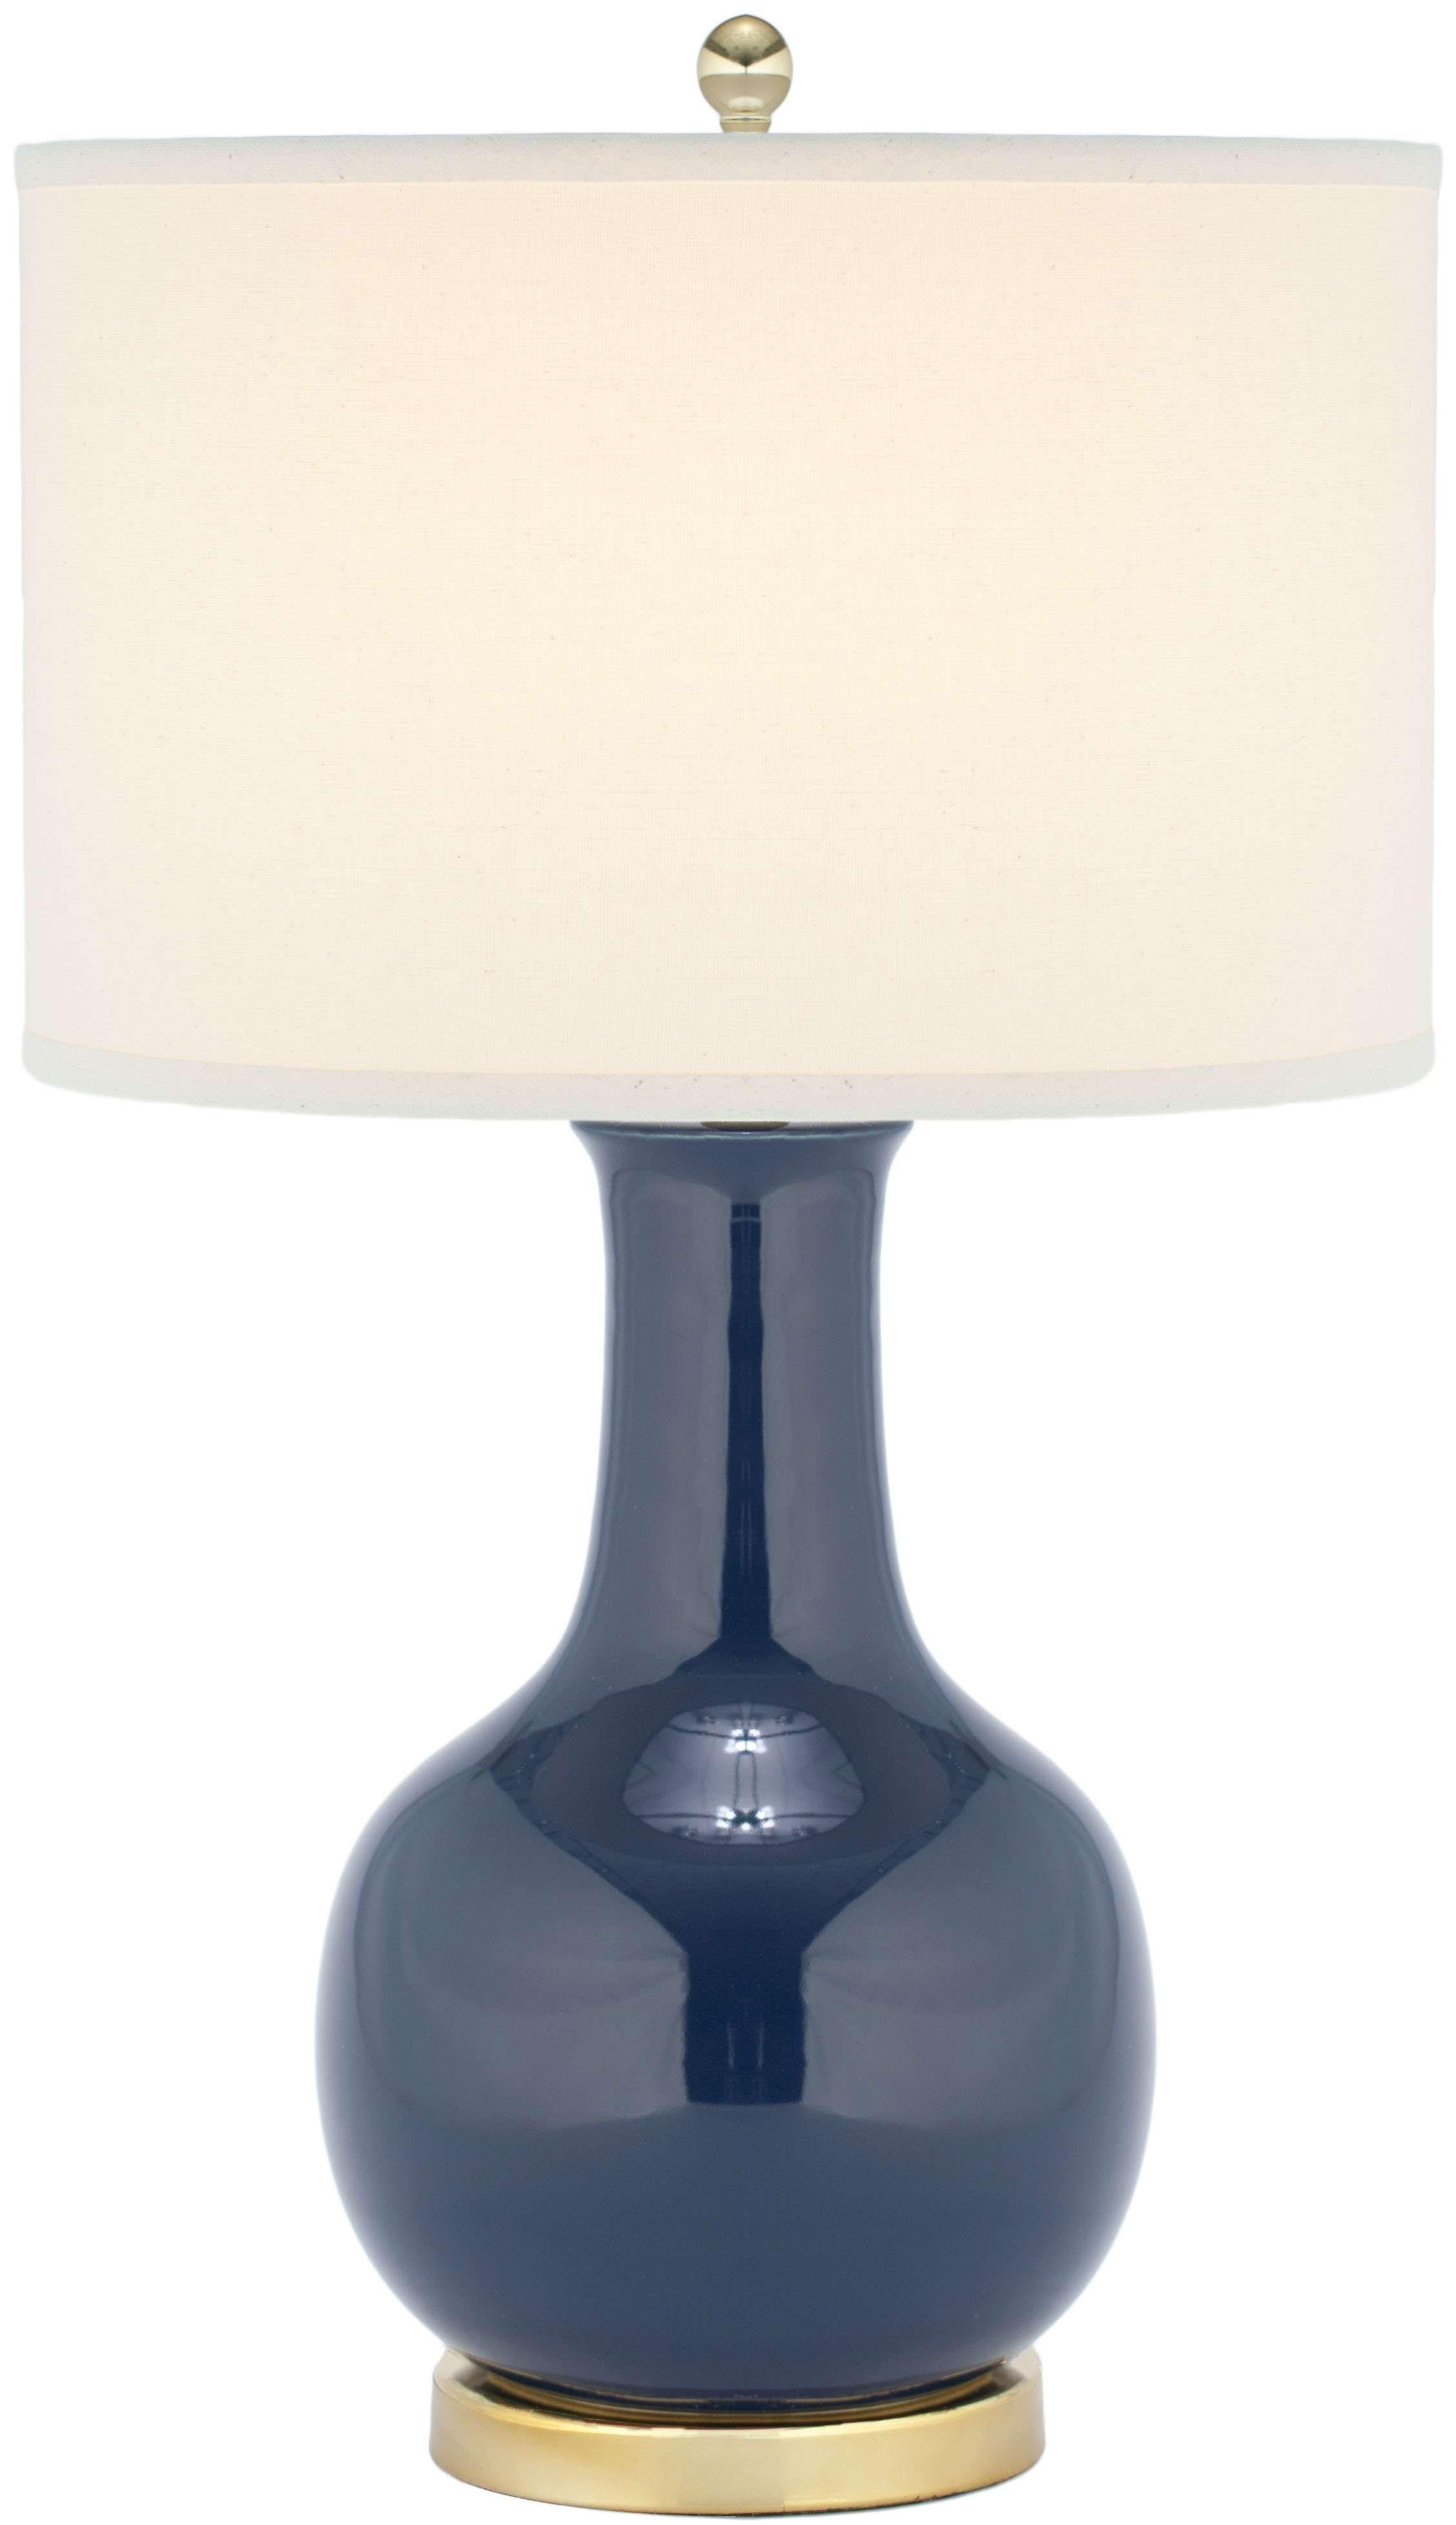 Safavieh Navy Blue 27 5 Ceramic Paris Lamp Goedekers Com Table Lamp Blue Table Lamp Lamps Living Room